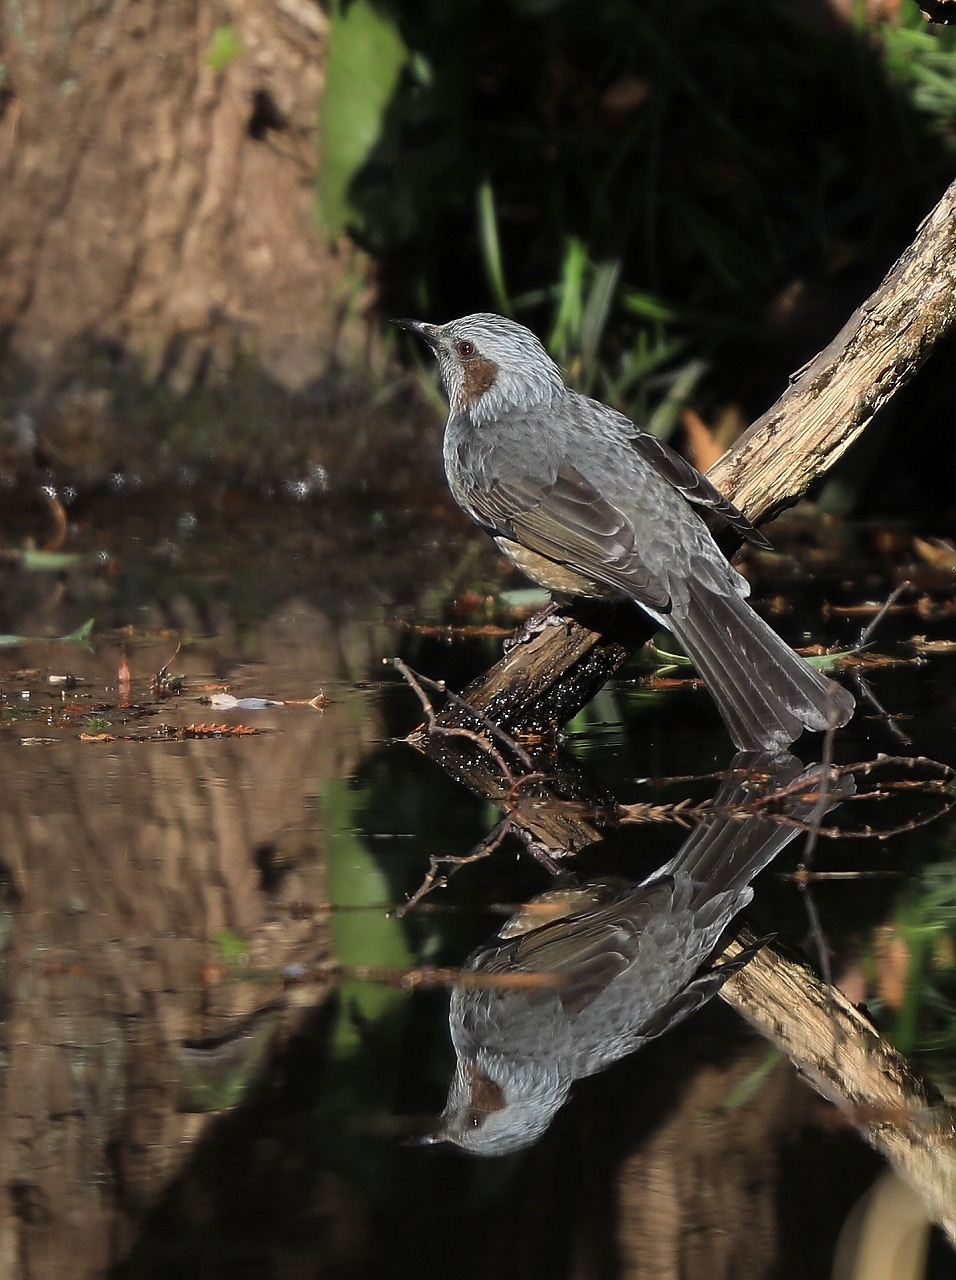 H野鳥の森にて_f0296999_15031839.jpg